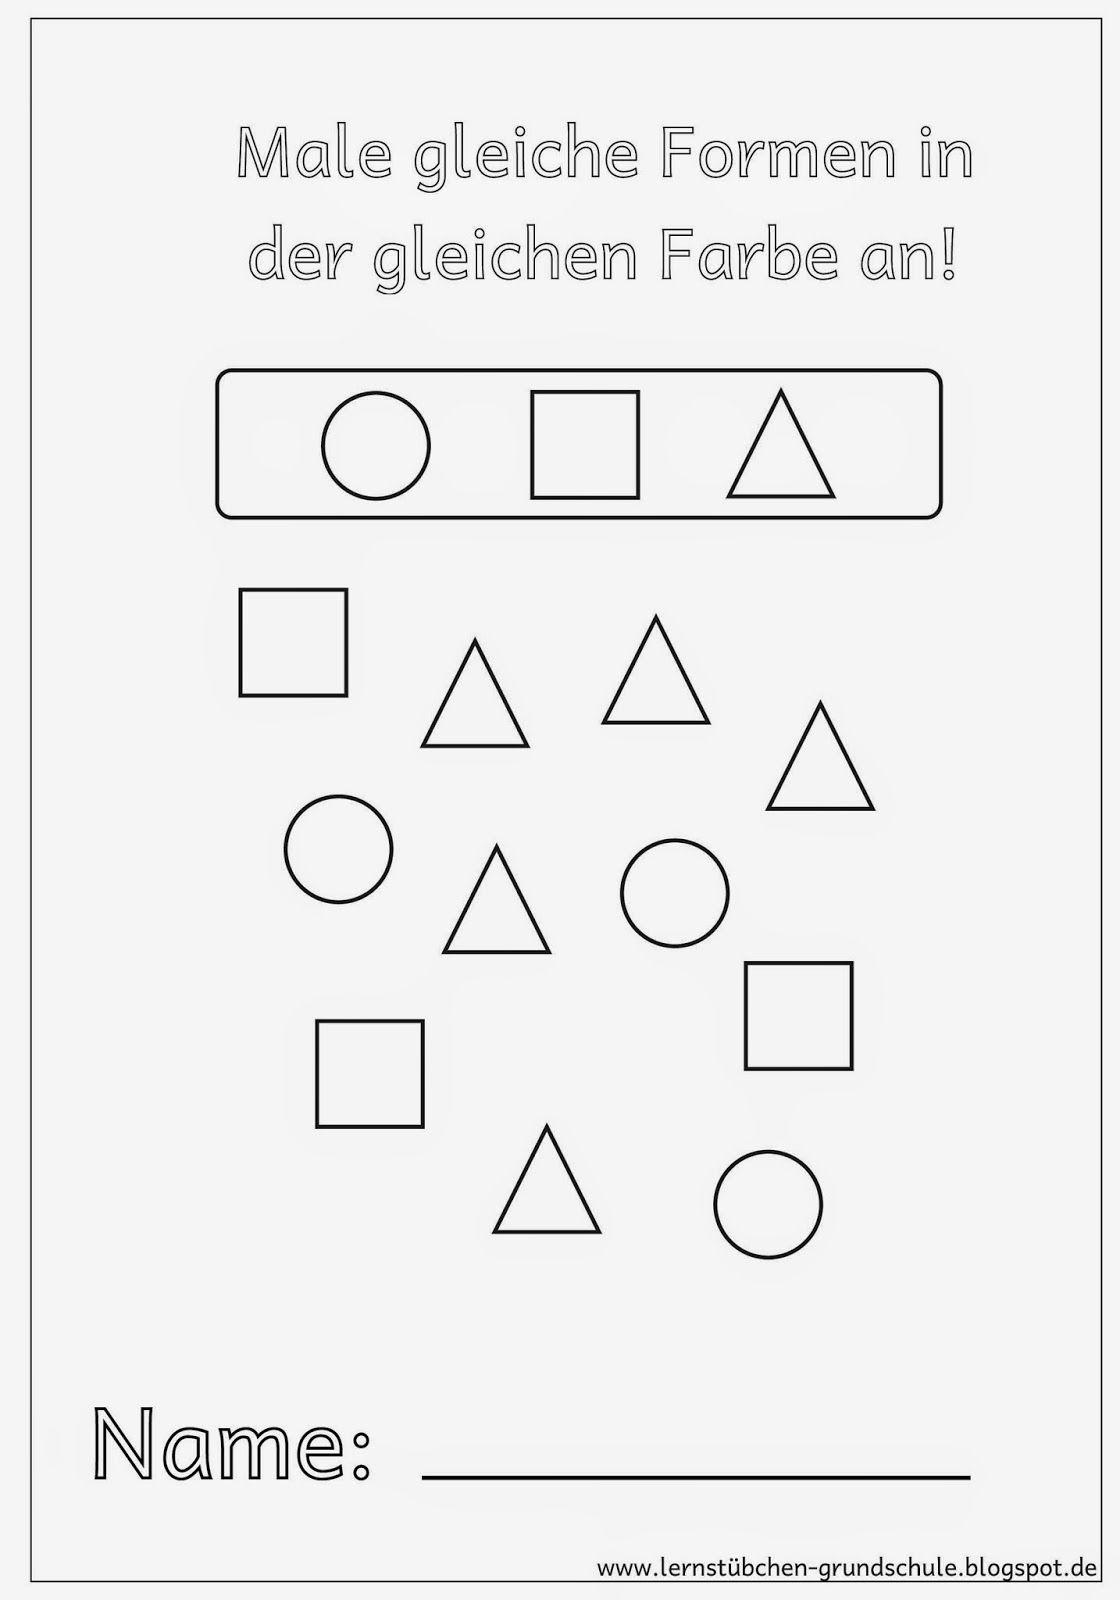 gleiche formen gleich anmalen odszukaj taki sam wz r pre school shapes und math. Black Bedroom Furniture Sets. Home Design Ideas